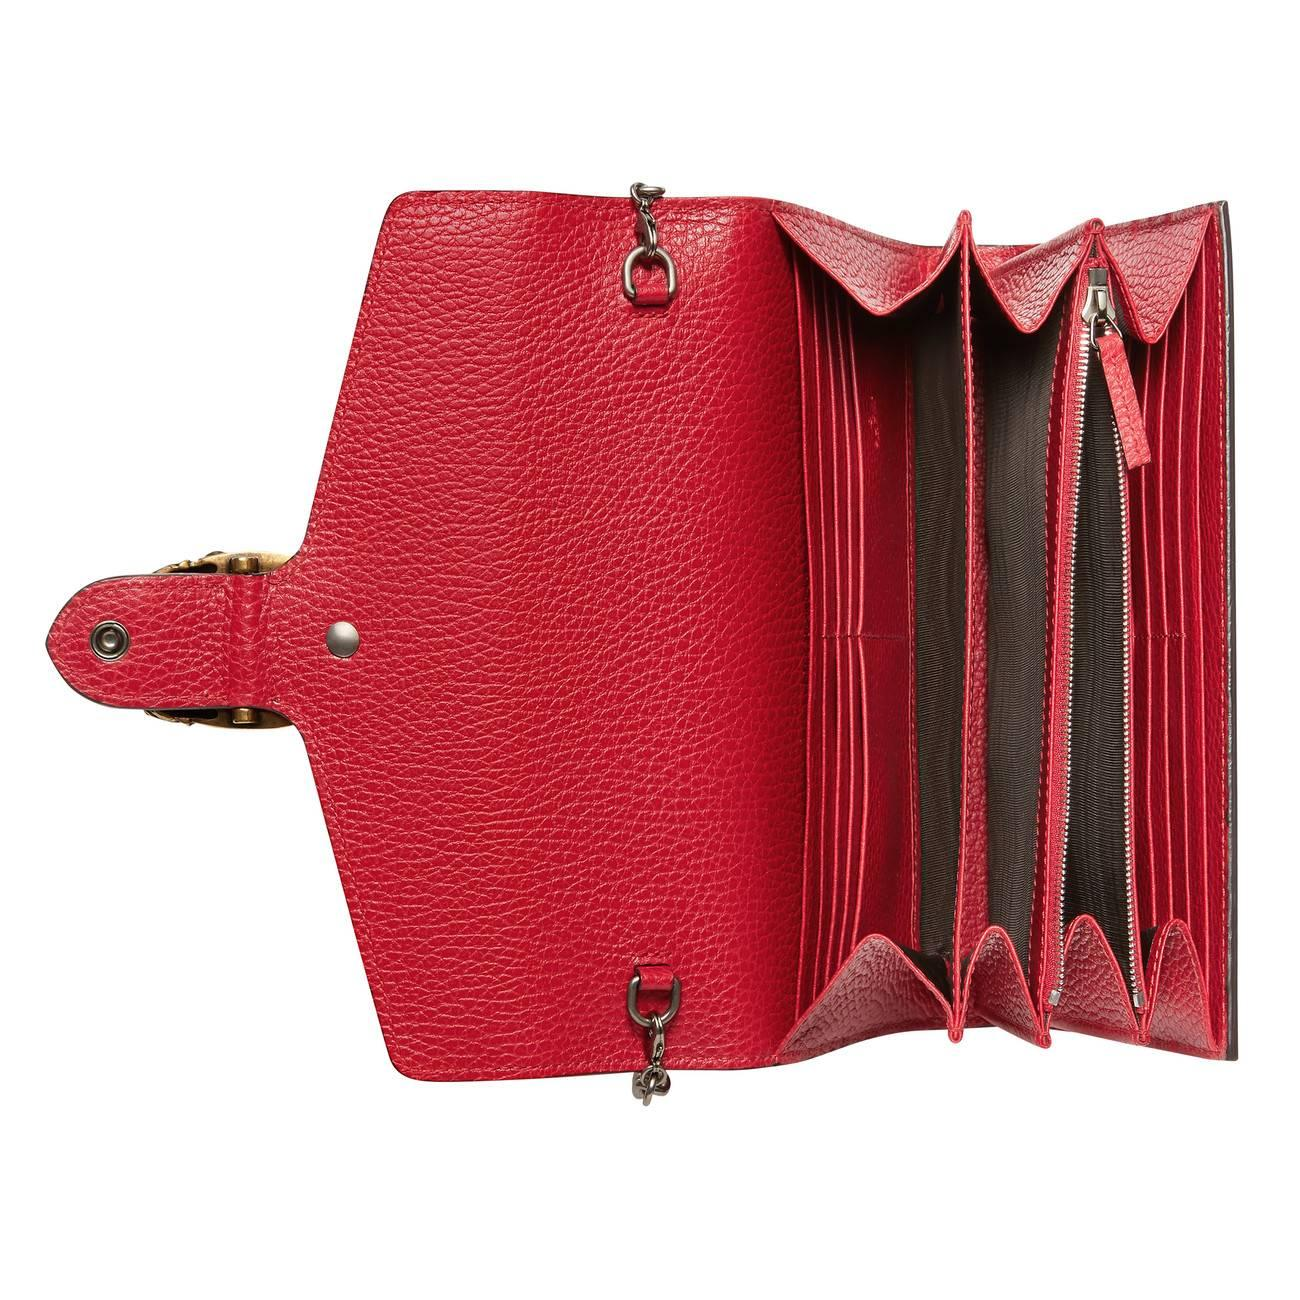 2de6b17dbe0 Gucci - Red Dionysus Leather Mini Chain Shoulder Bag - Lyst. View fullscreen